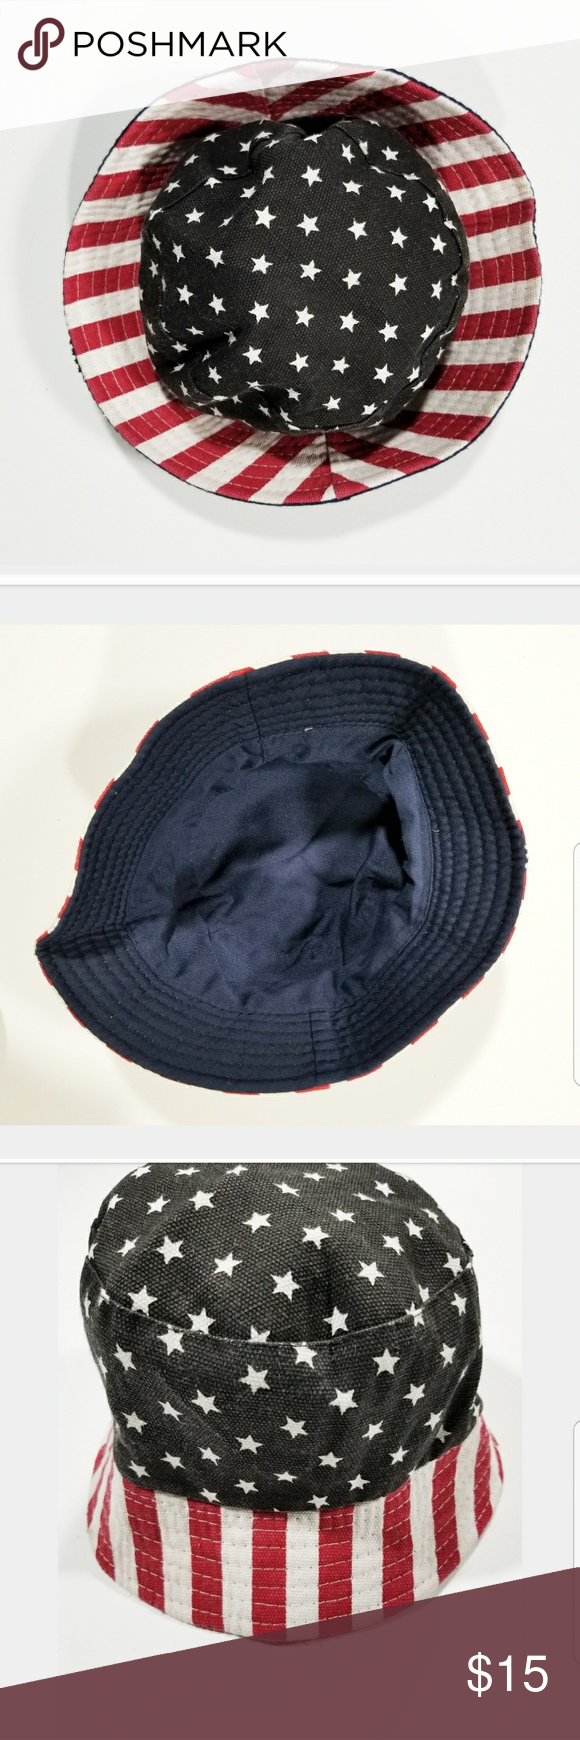 59181569ae2 Vintage Denim USA 92 90s American Flag Bucket Hat This awesome unisex denim  dark blackish blue